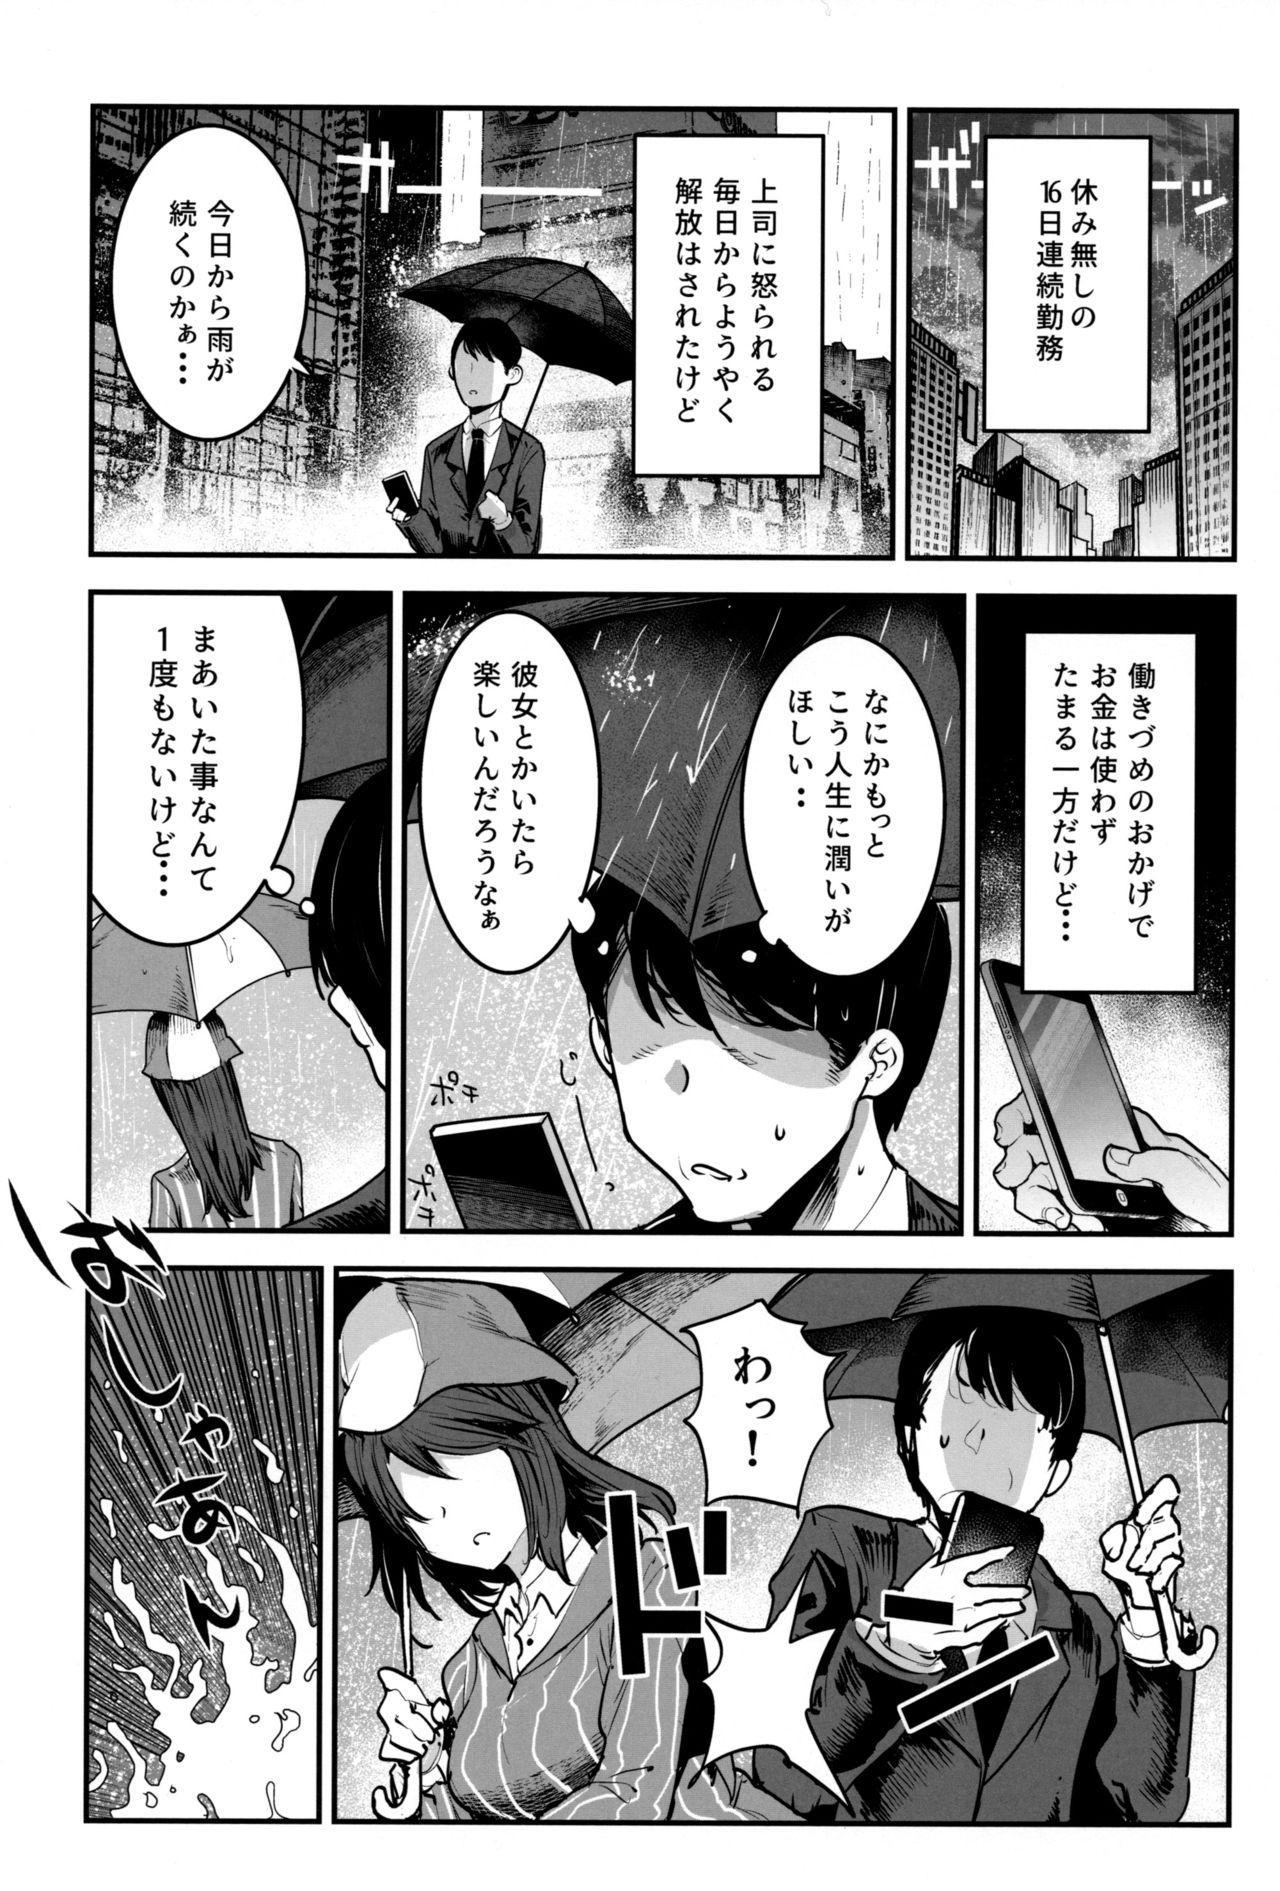 GirlPan Rakugakichou 10 1